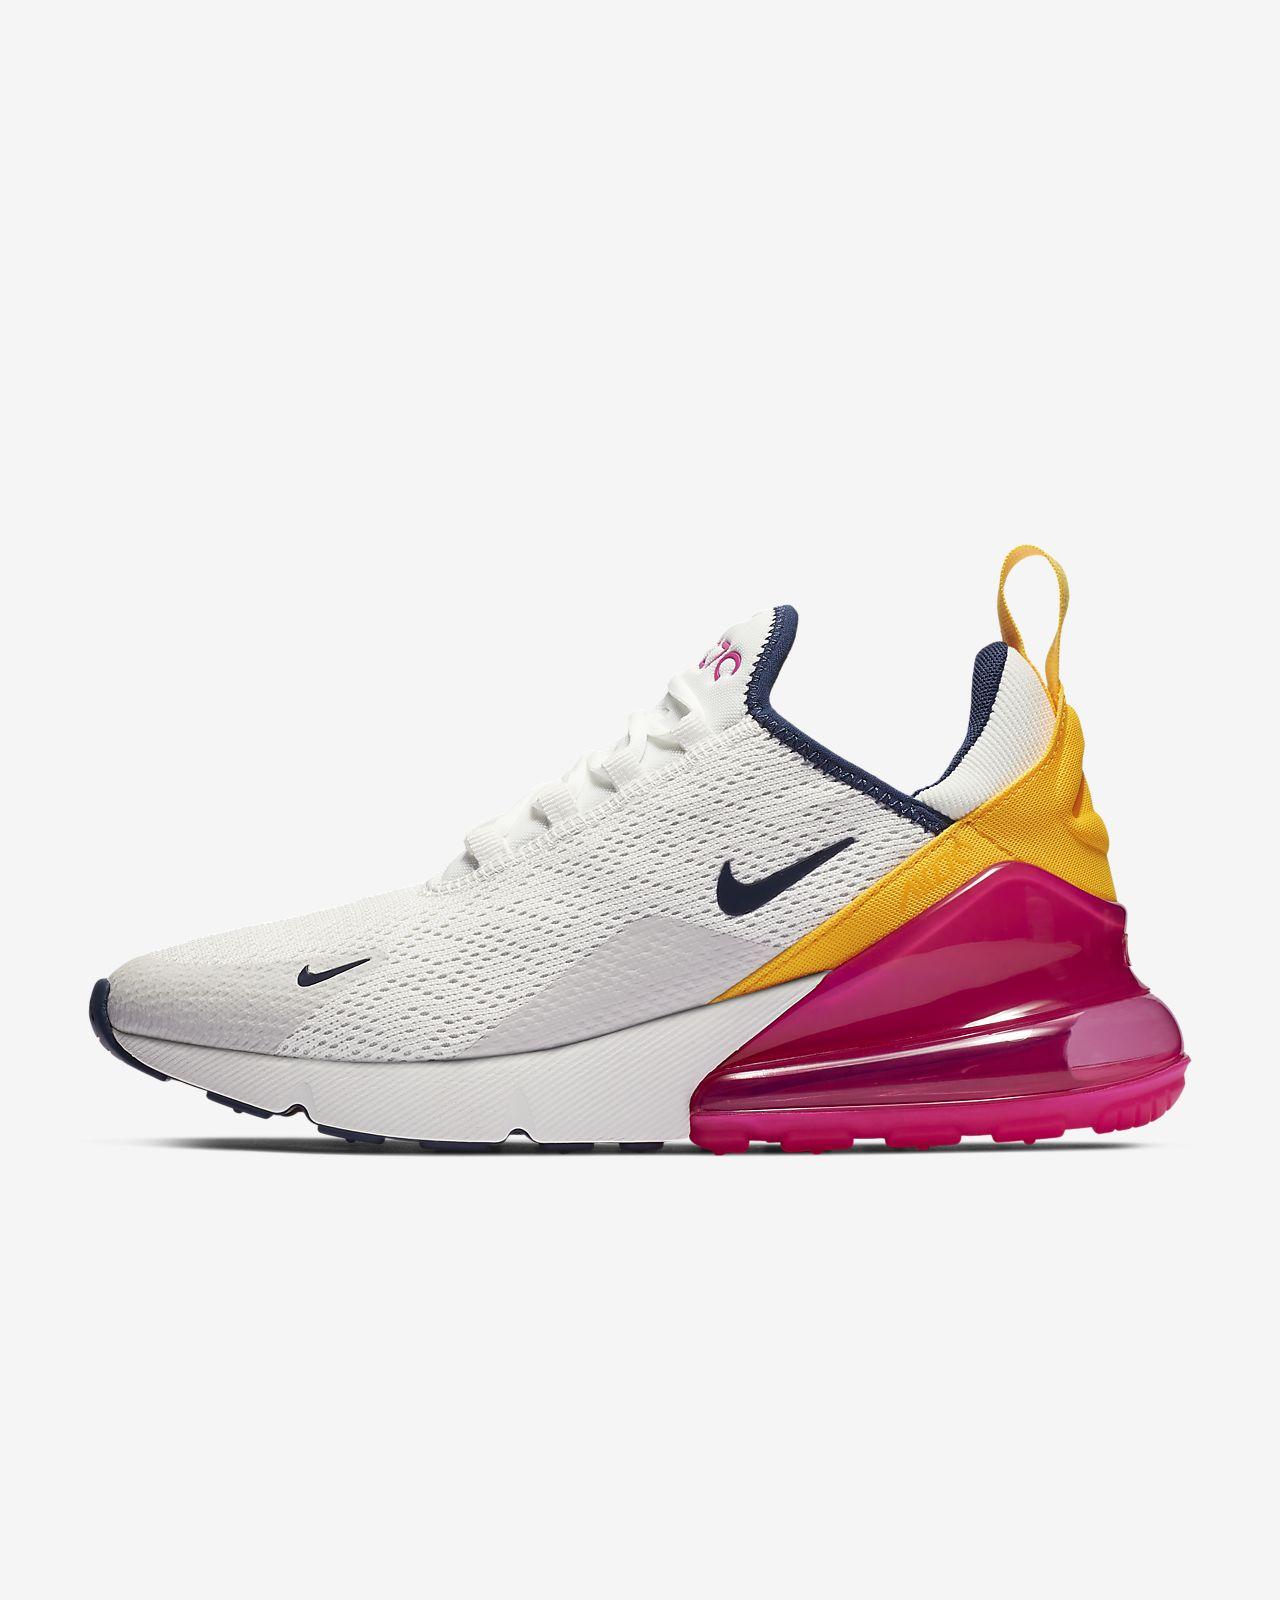 los angeles dbf77 3447e ... Nike Air Max 270 Premium 女鞋